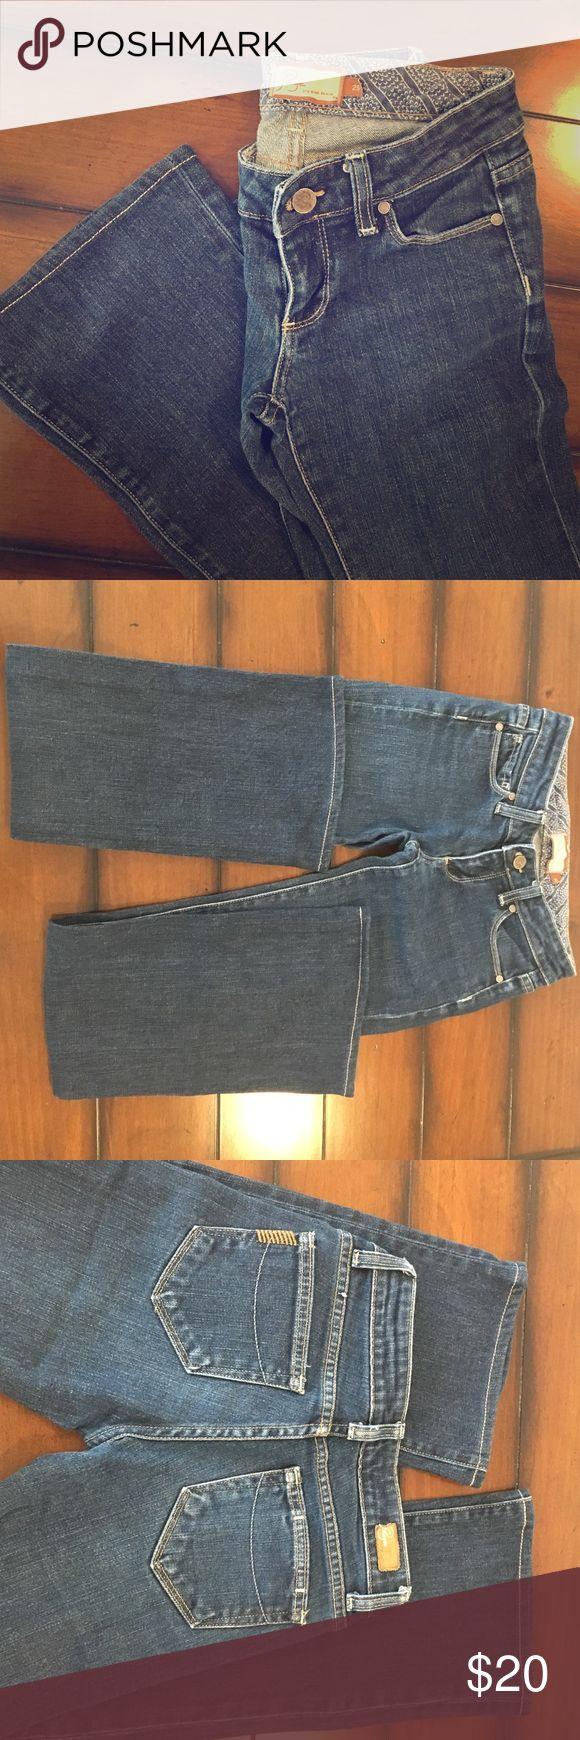 "Paige Premium Denim Jeans size 25 Paige Premium Denim, 'Laure Canyon', bootcut jeans, size 25. Medium wash, EUC! No fraying, rips, stains or tears. 29"" inseam. Paige Jeans Jeans Boot Cut"